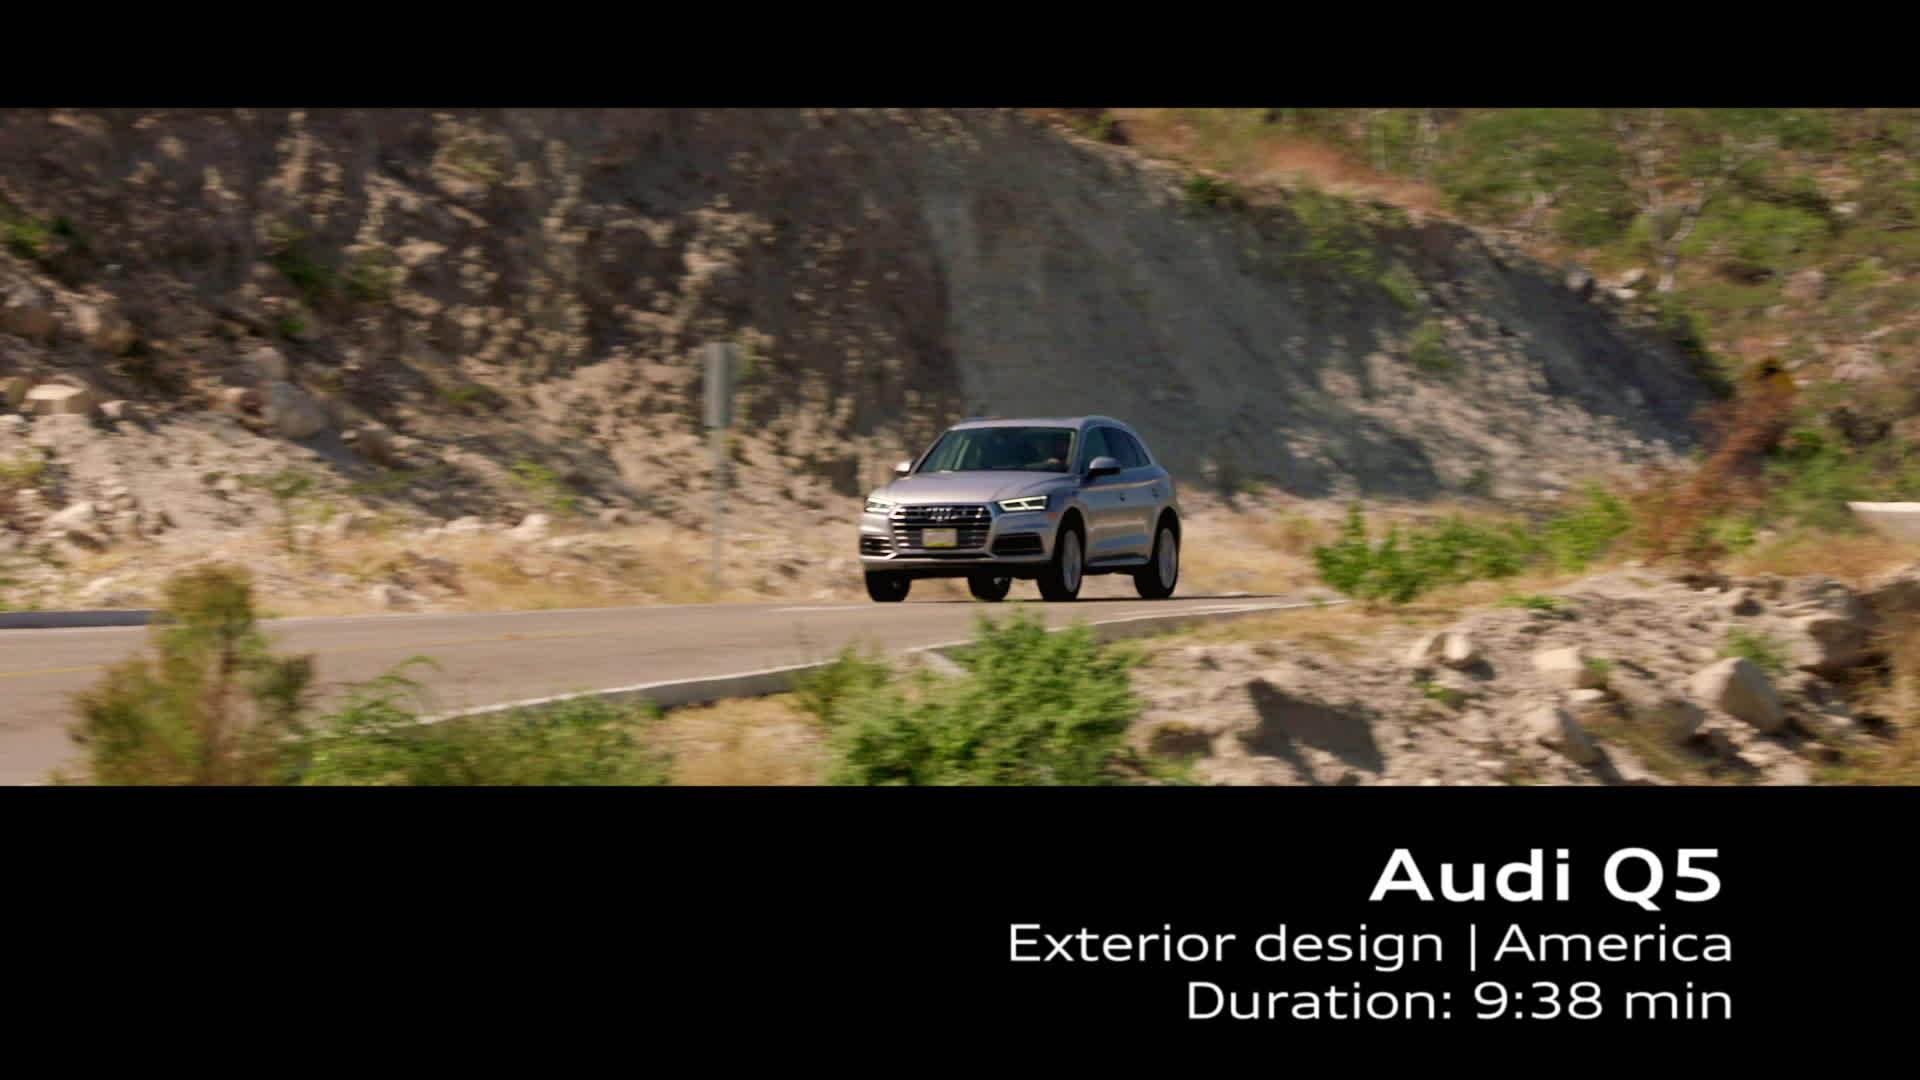 Footage Audi Q5 - U.S. Specifications